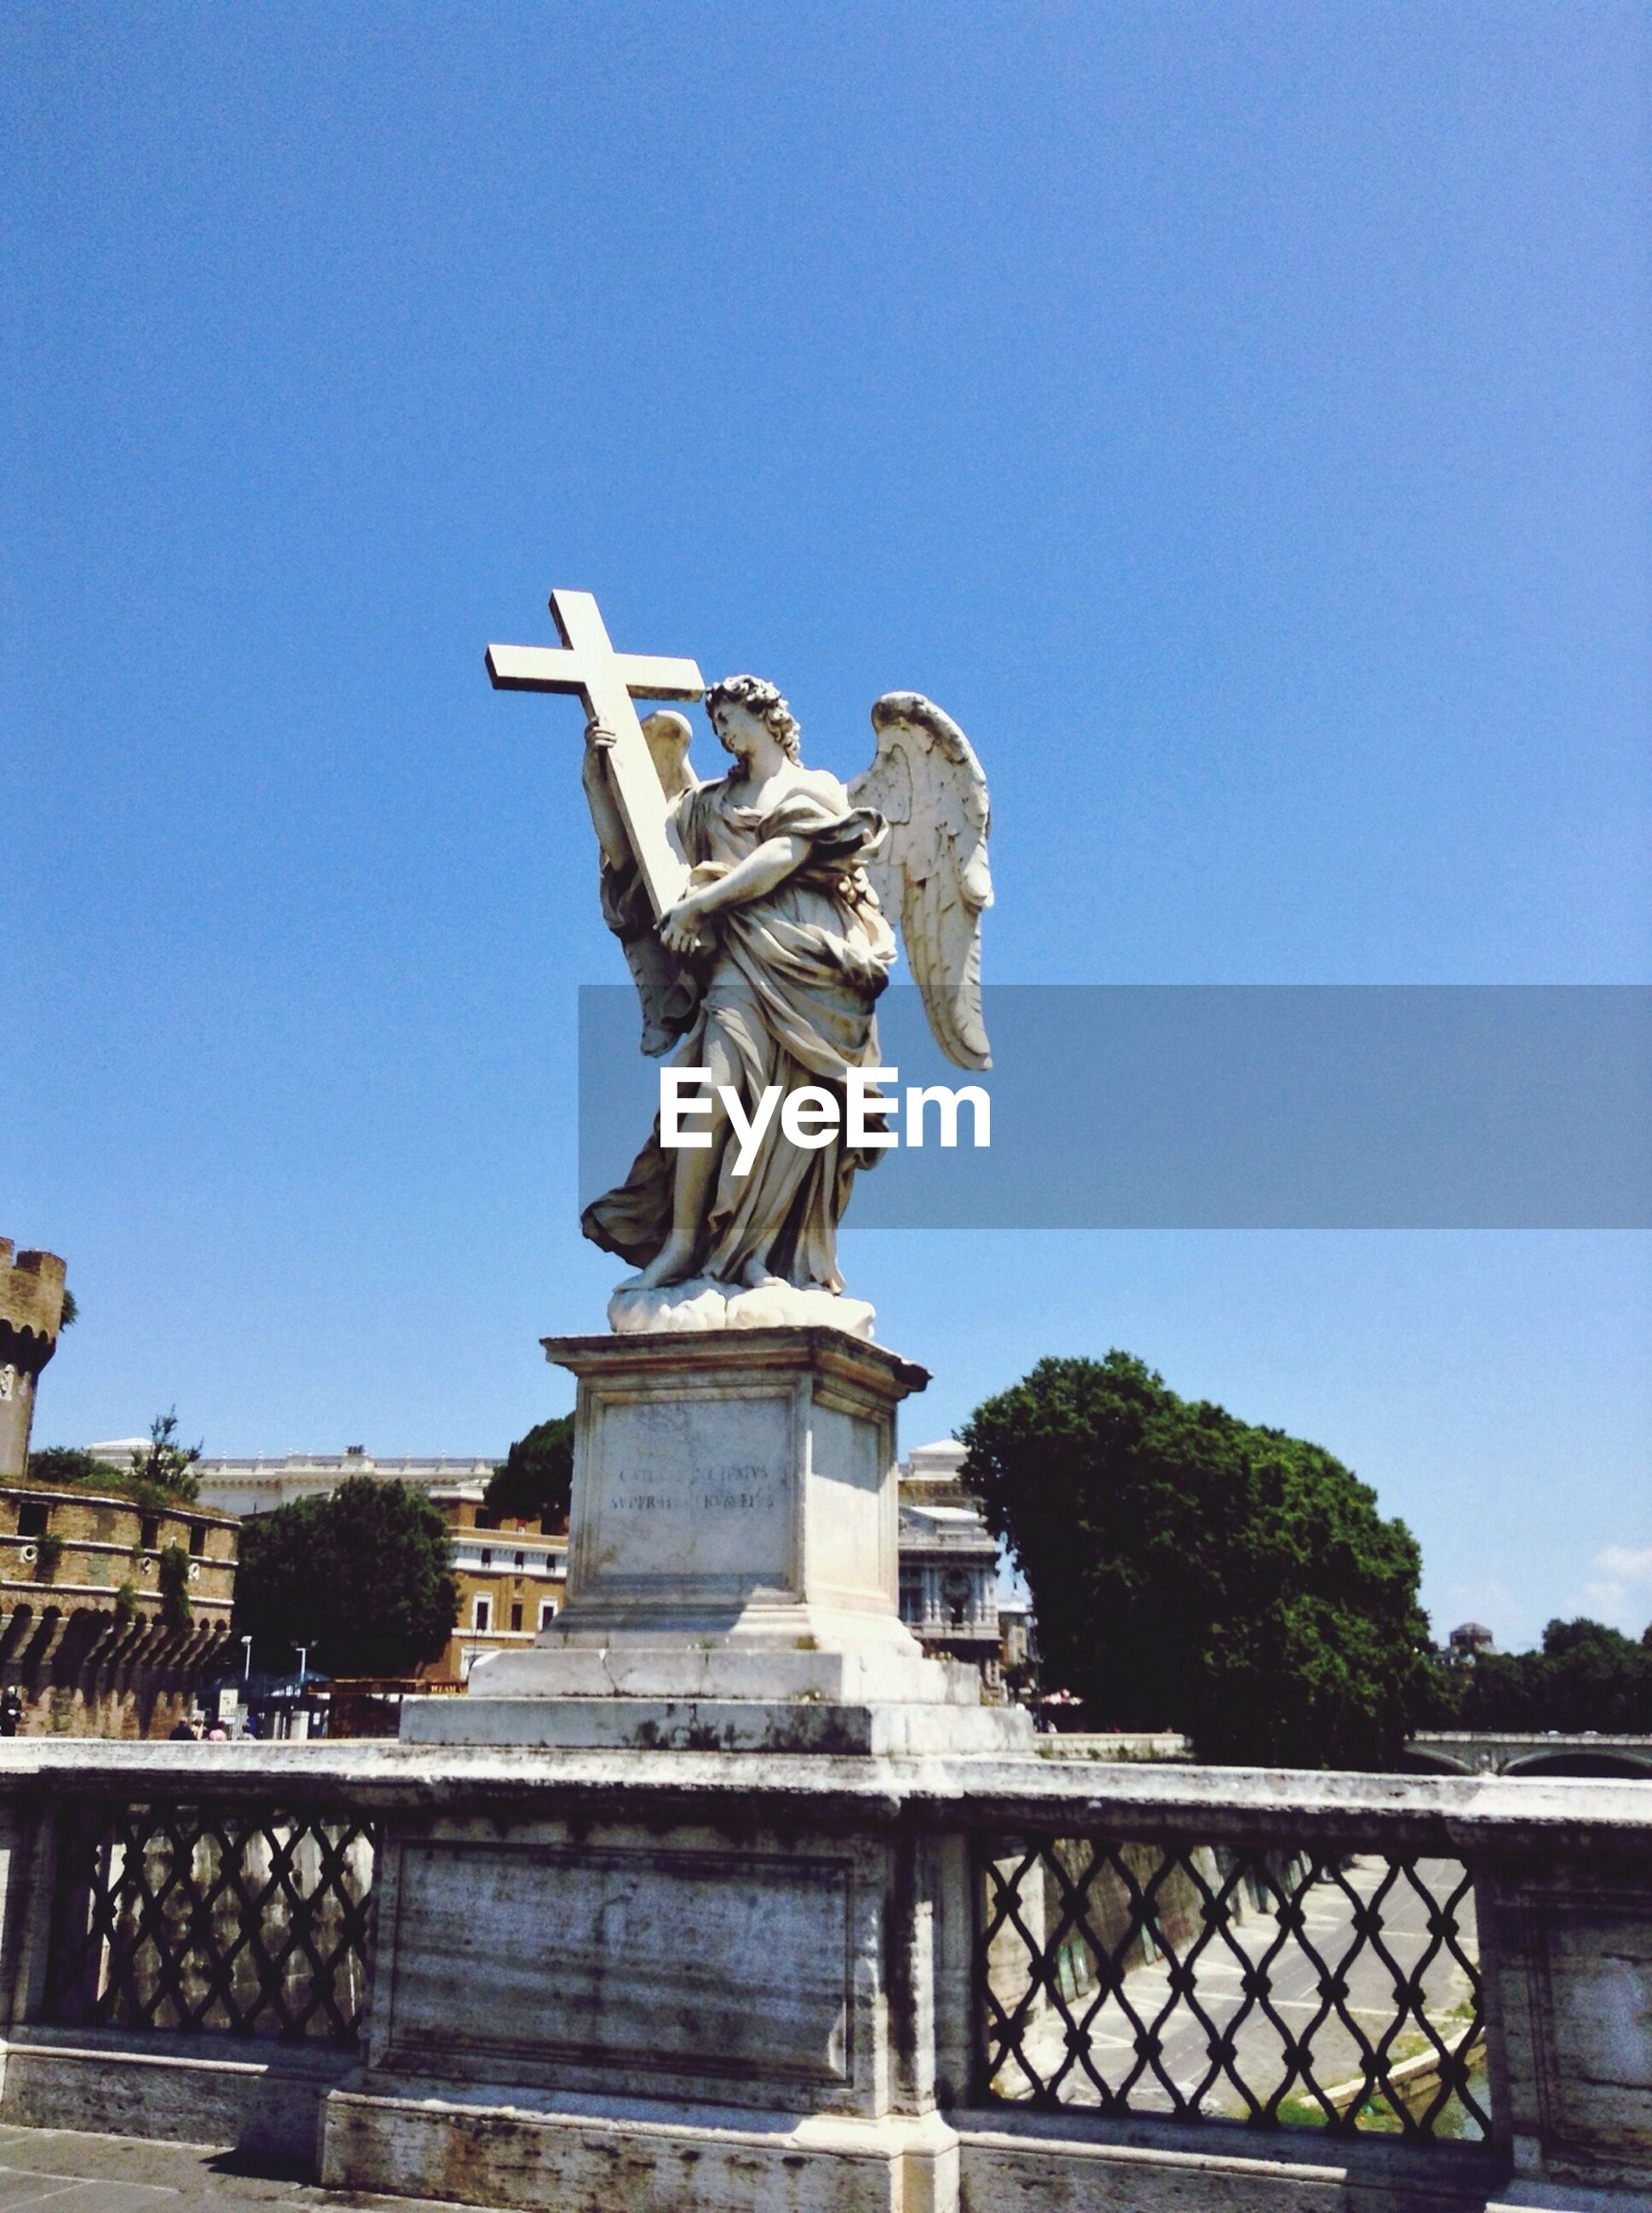 Statue of angle carrying cross on bridge balustrade